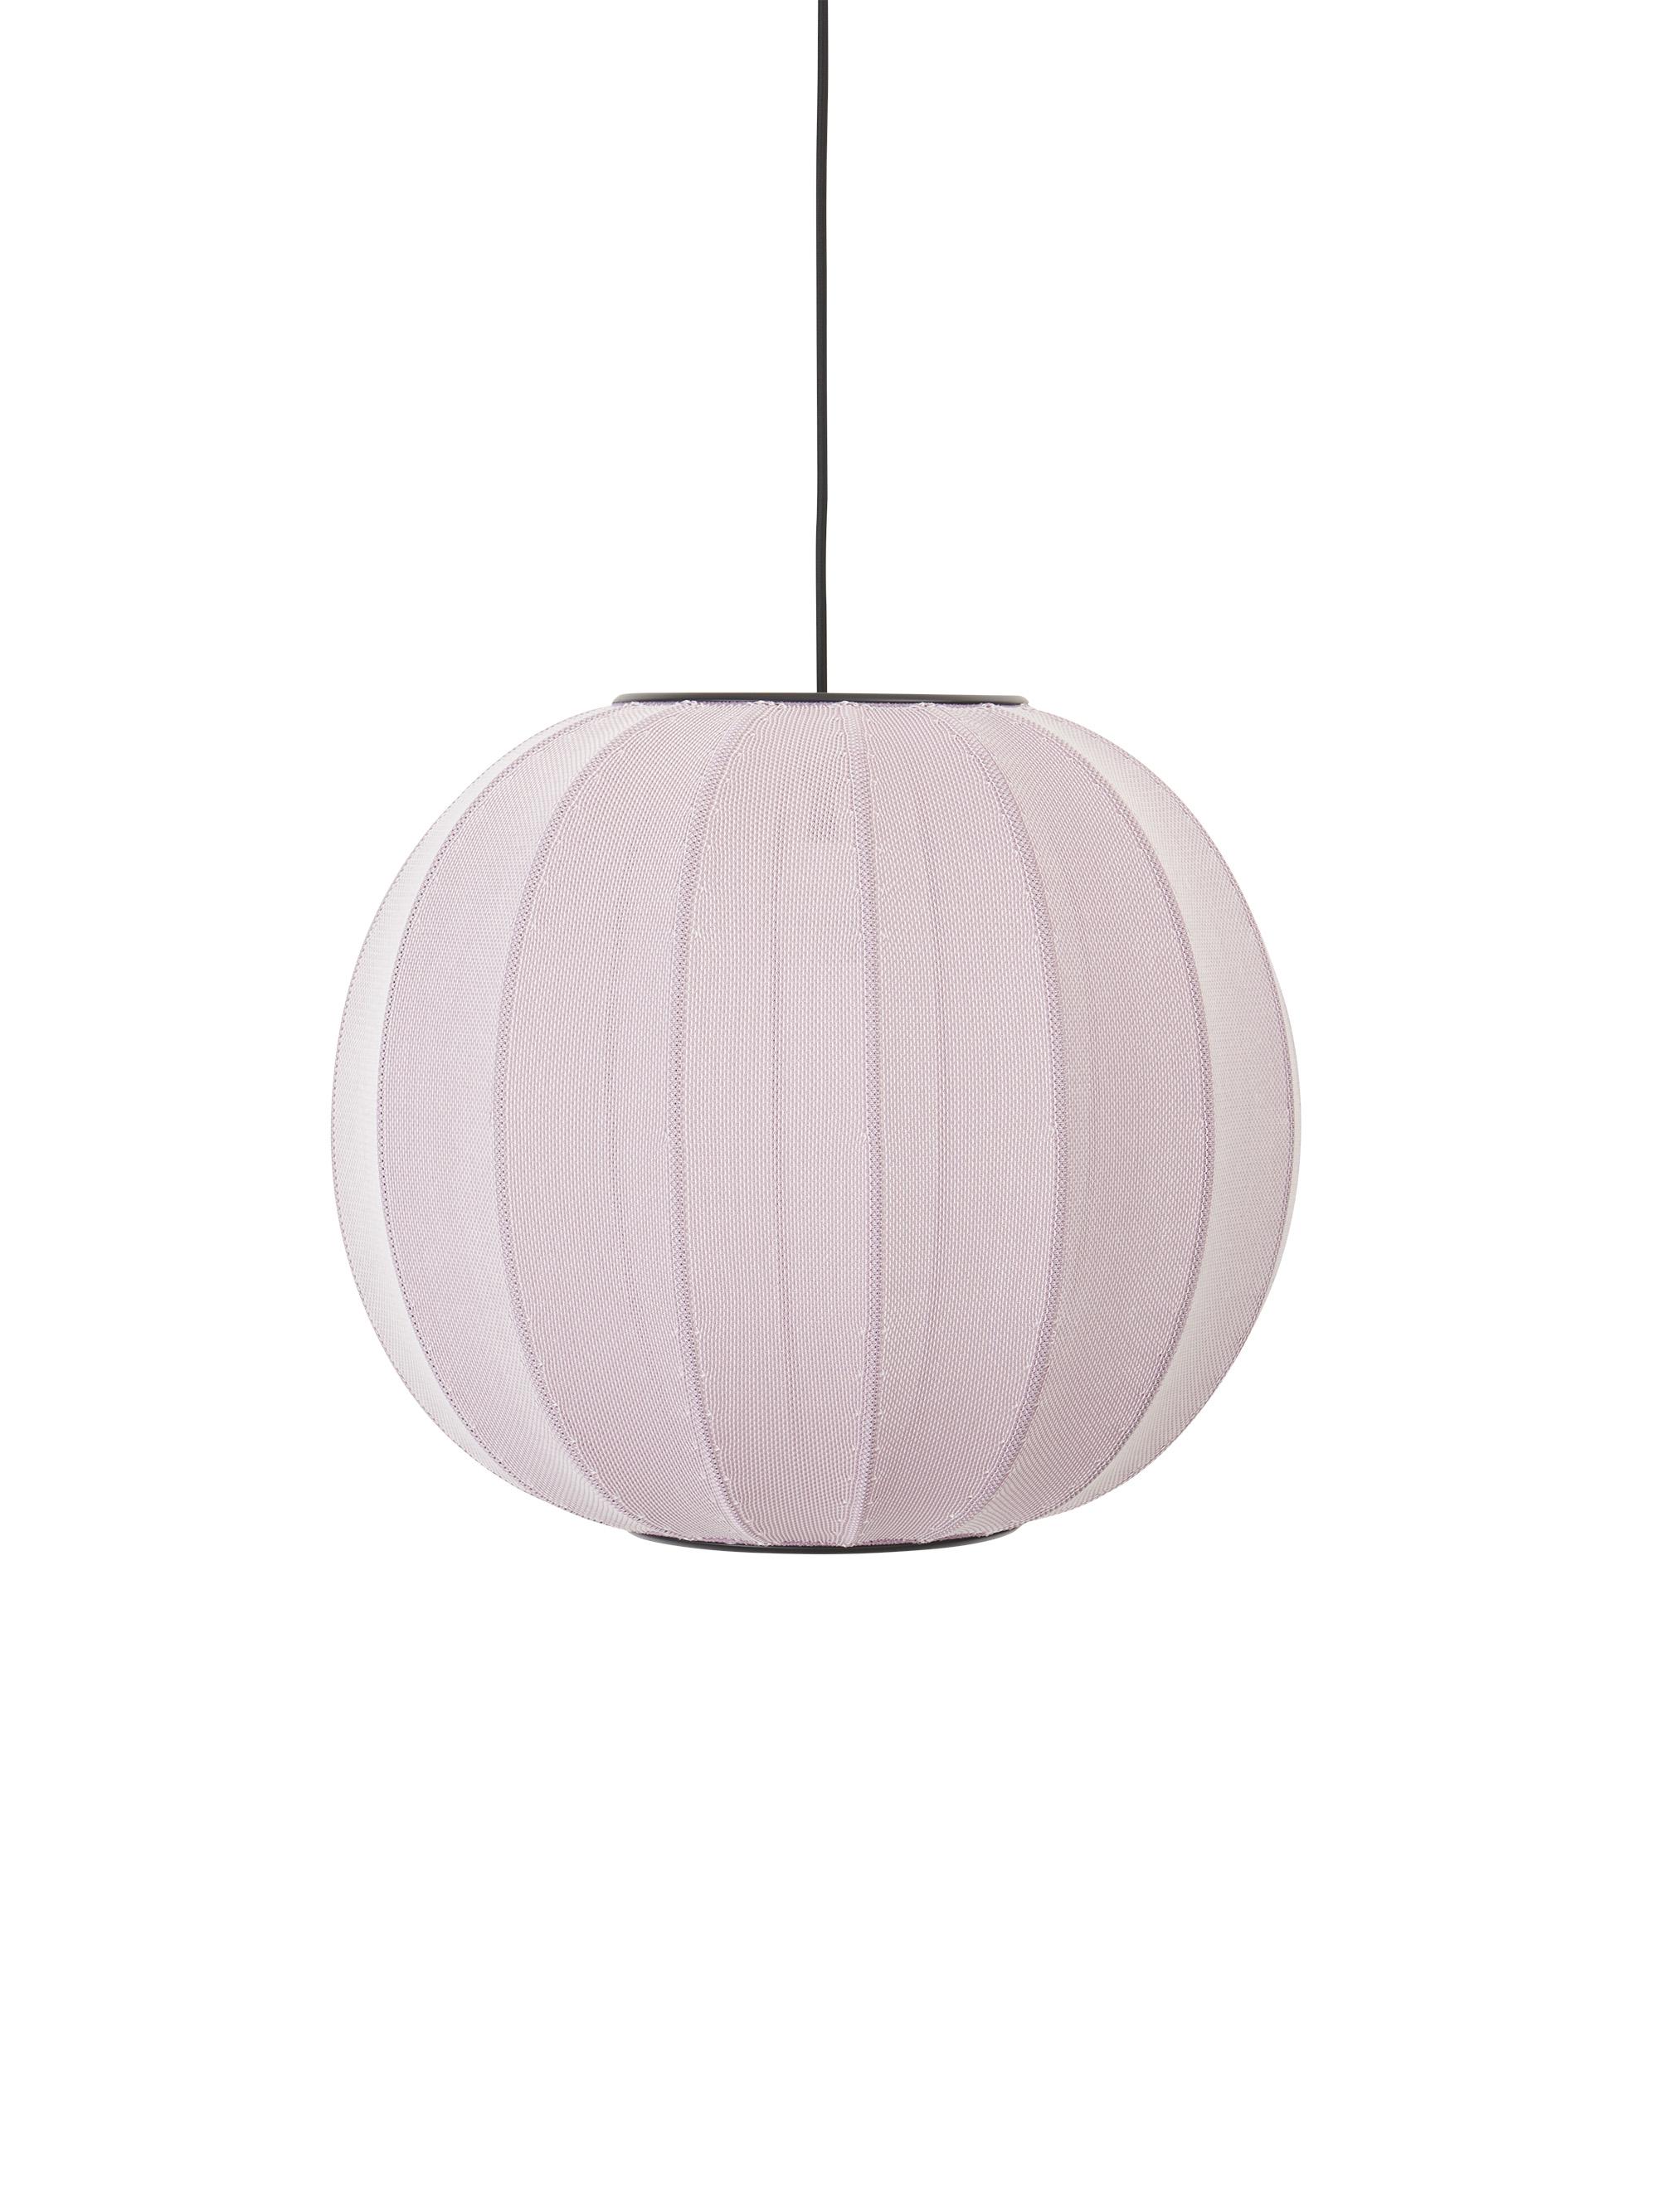 Made by Hand Knit Wit Pendelleuchte Light Pink ø45cm